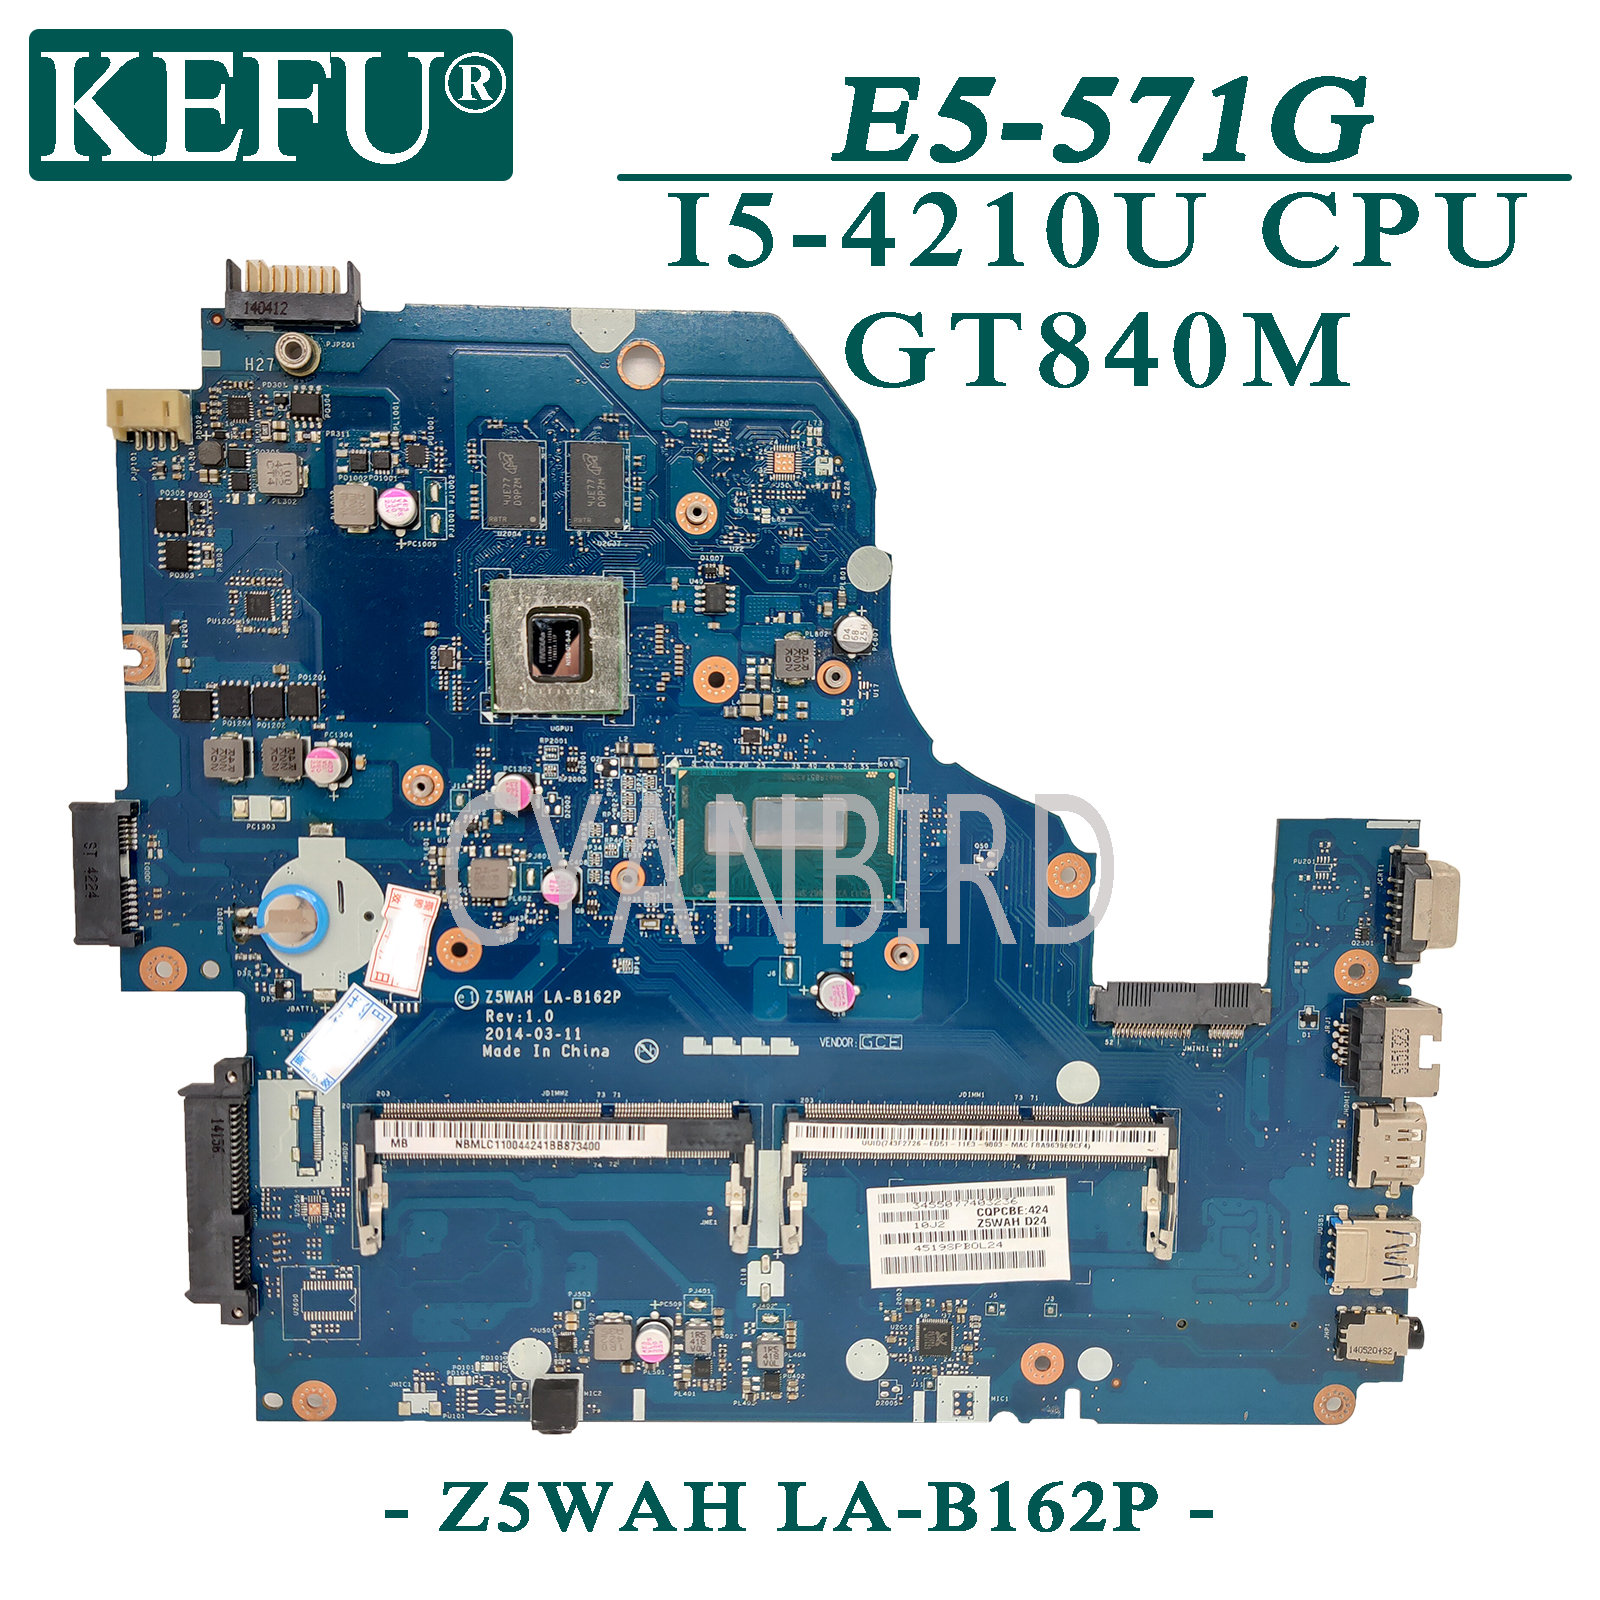 KEFU Z5WAH LA-B162P Original Mainboard For Acer E5-571G With I5-4210U GT840M Laptop Motherboard